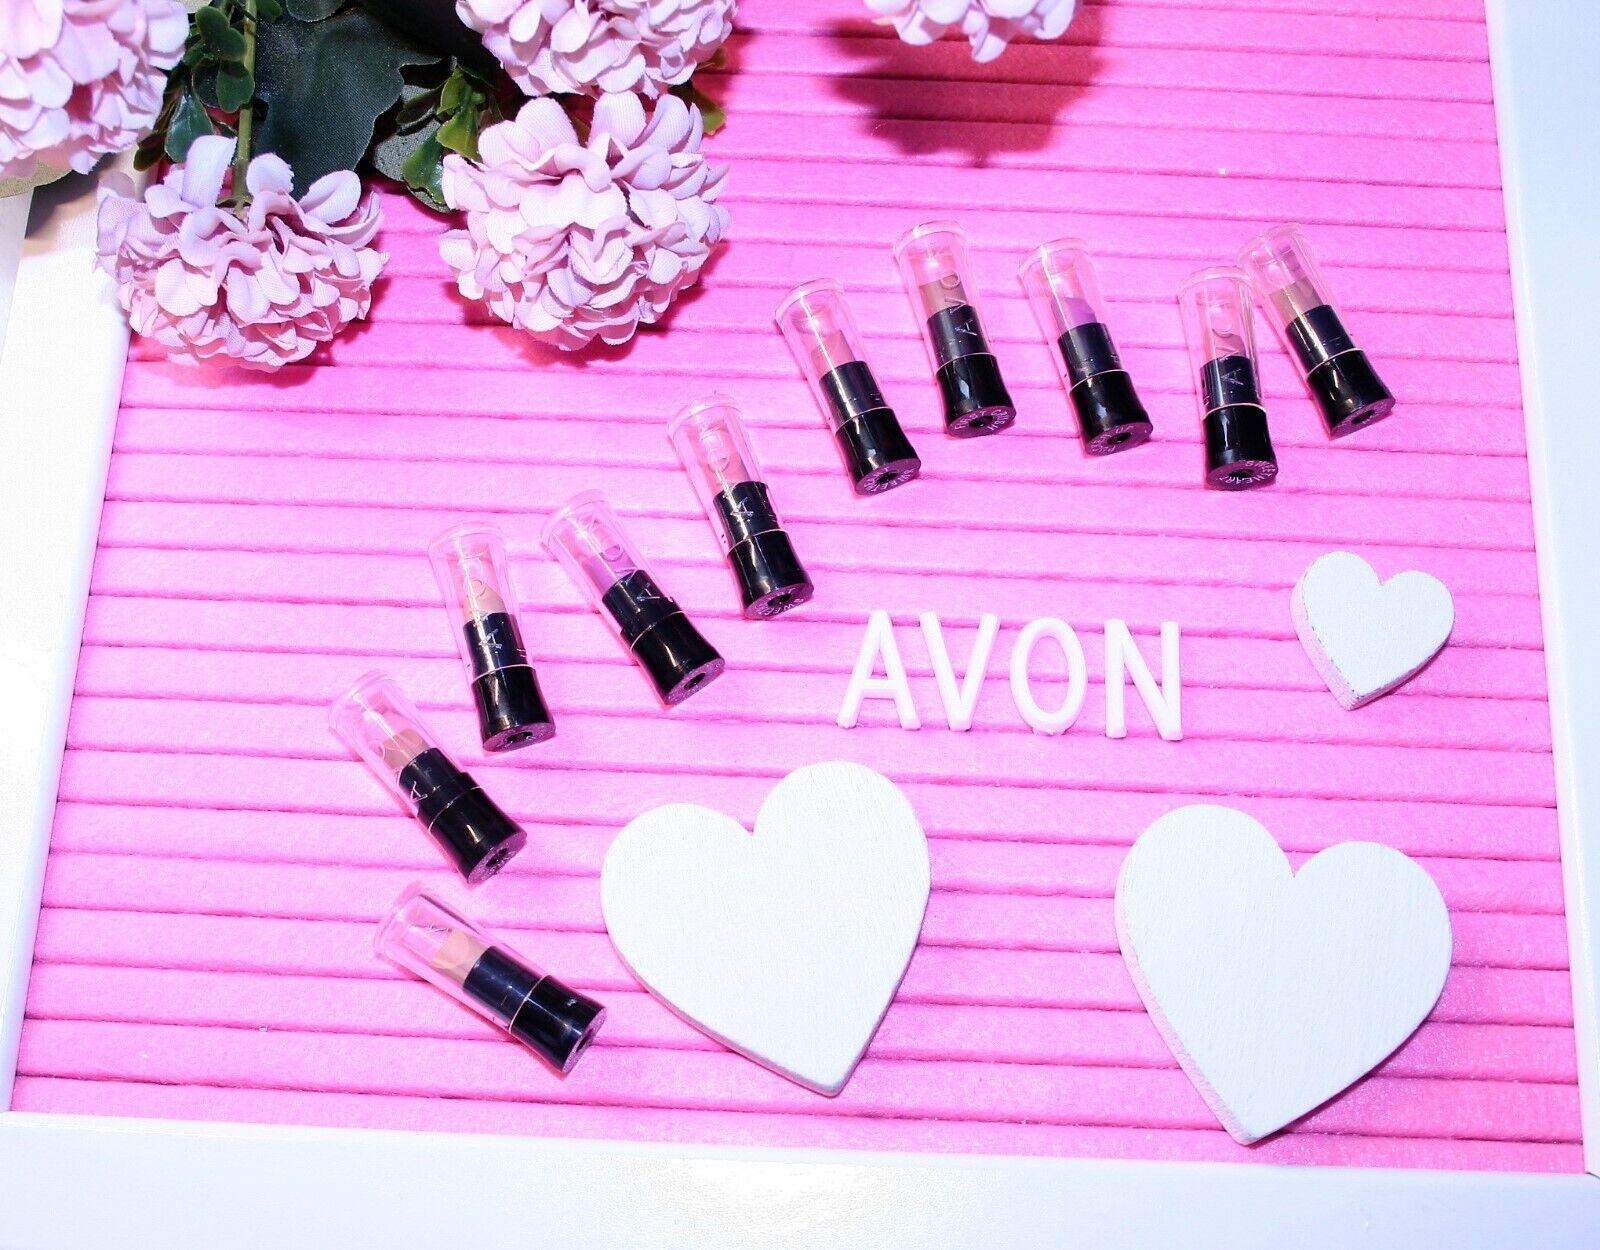 10 Mini Avon Lippenstifte Gemischt  Lippenstift Kosmetik Probe Schminke